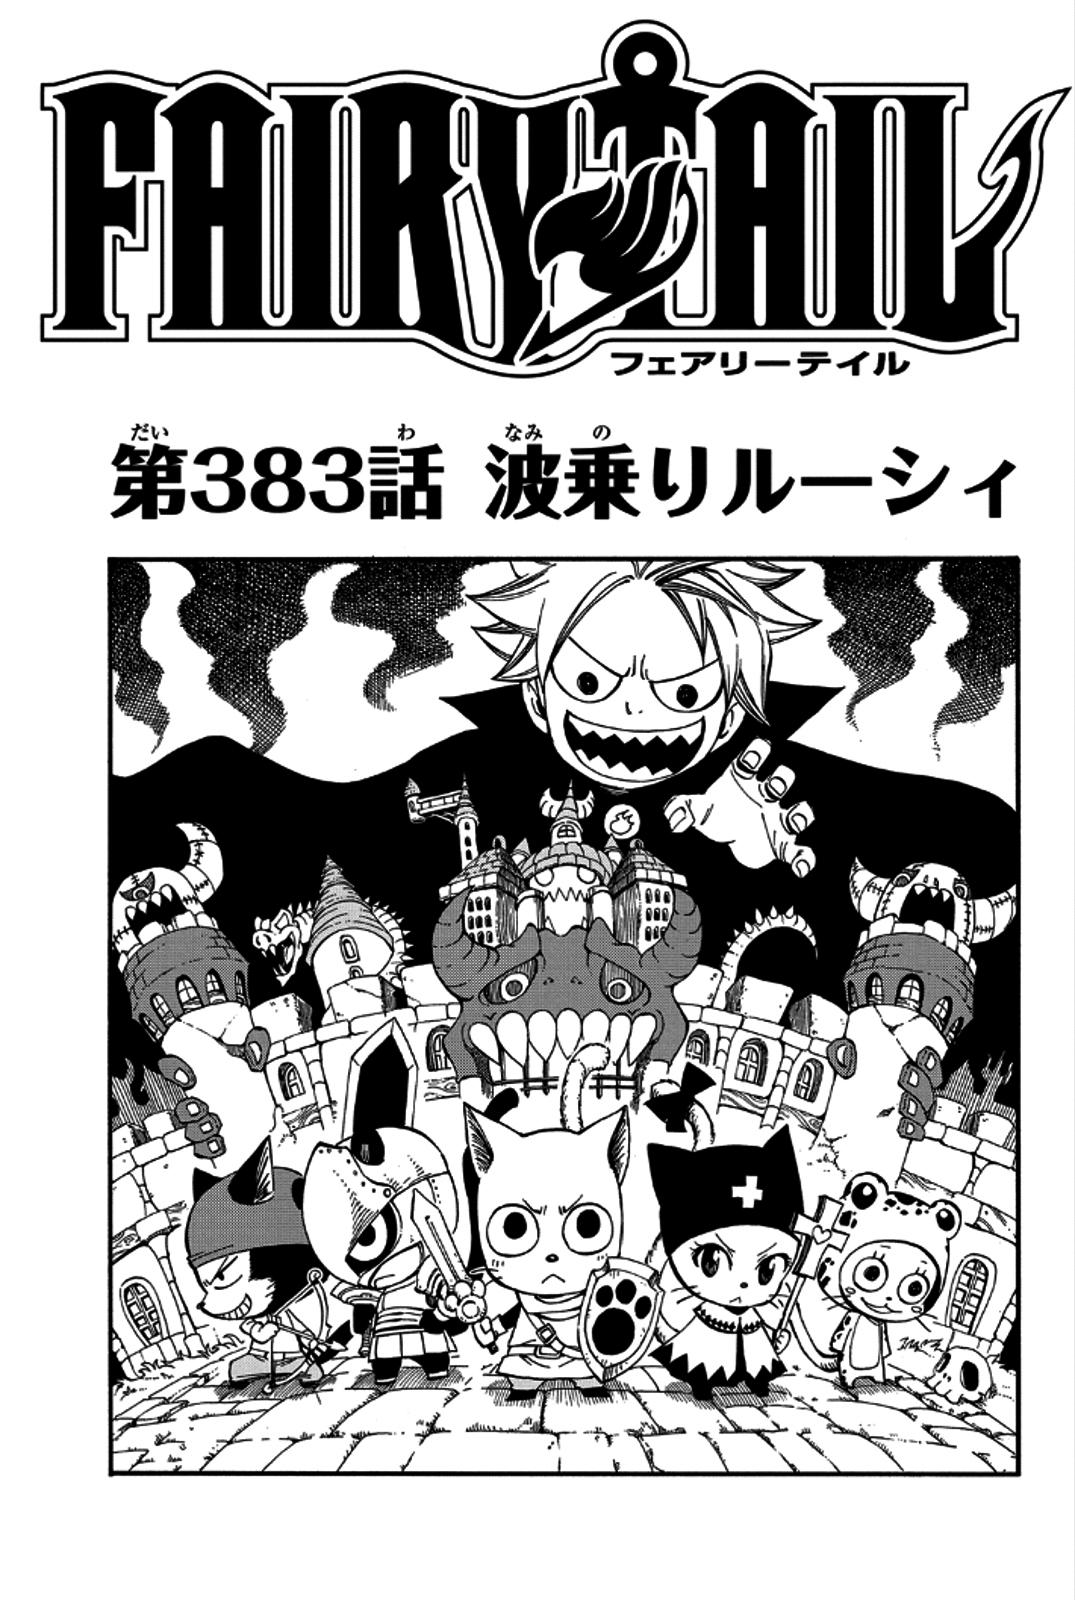 Chapter 383 Fairy Tail Wiki Fandom Powered By Wikia